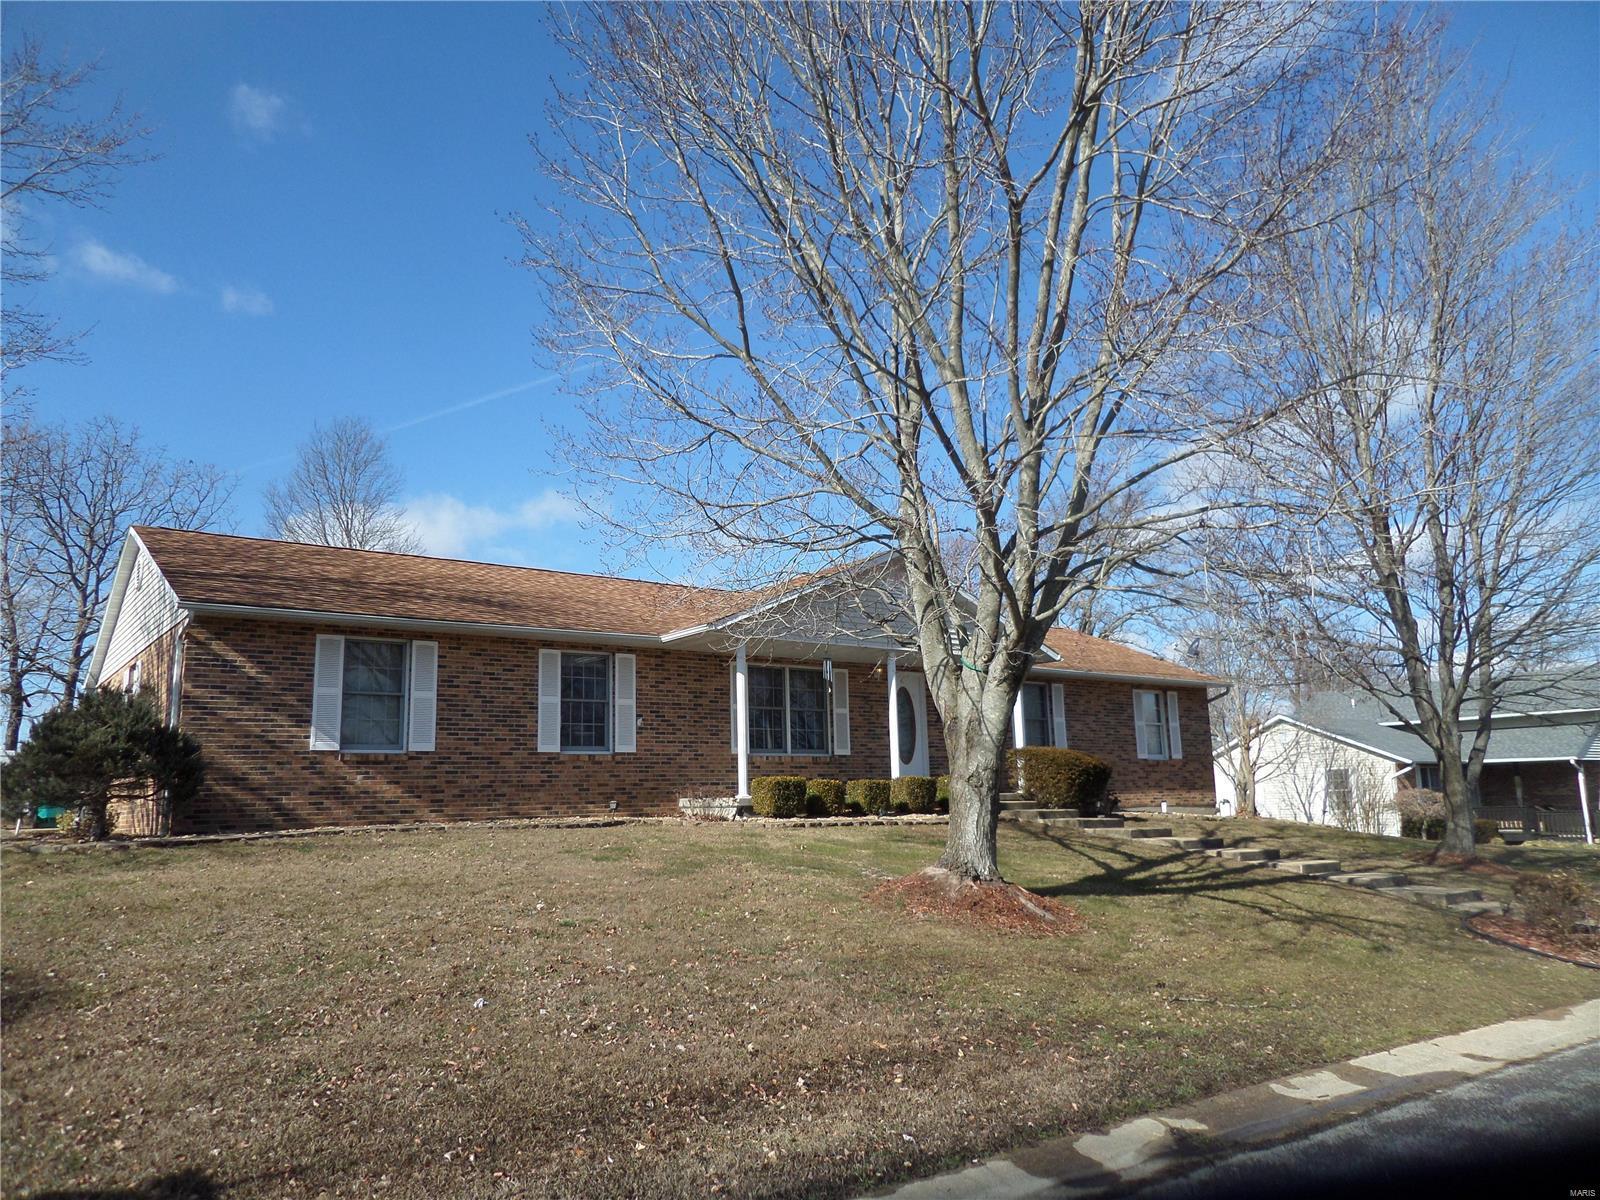 573 Sonya Property Photo - Sullivan, MO real estate listing